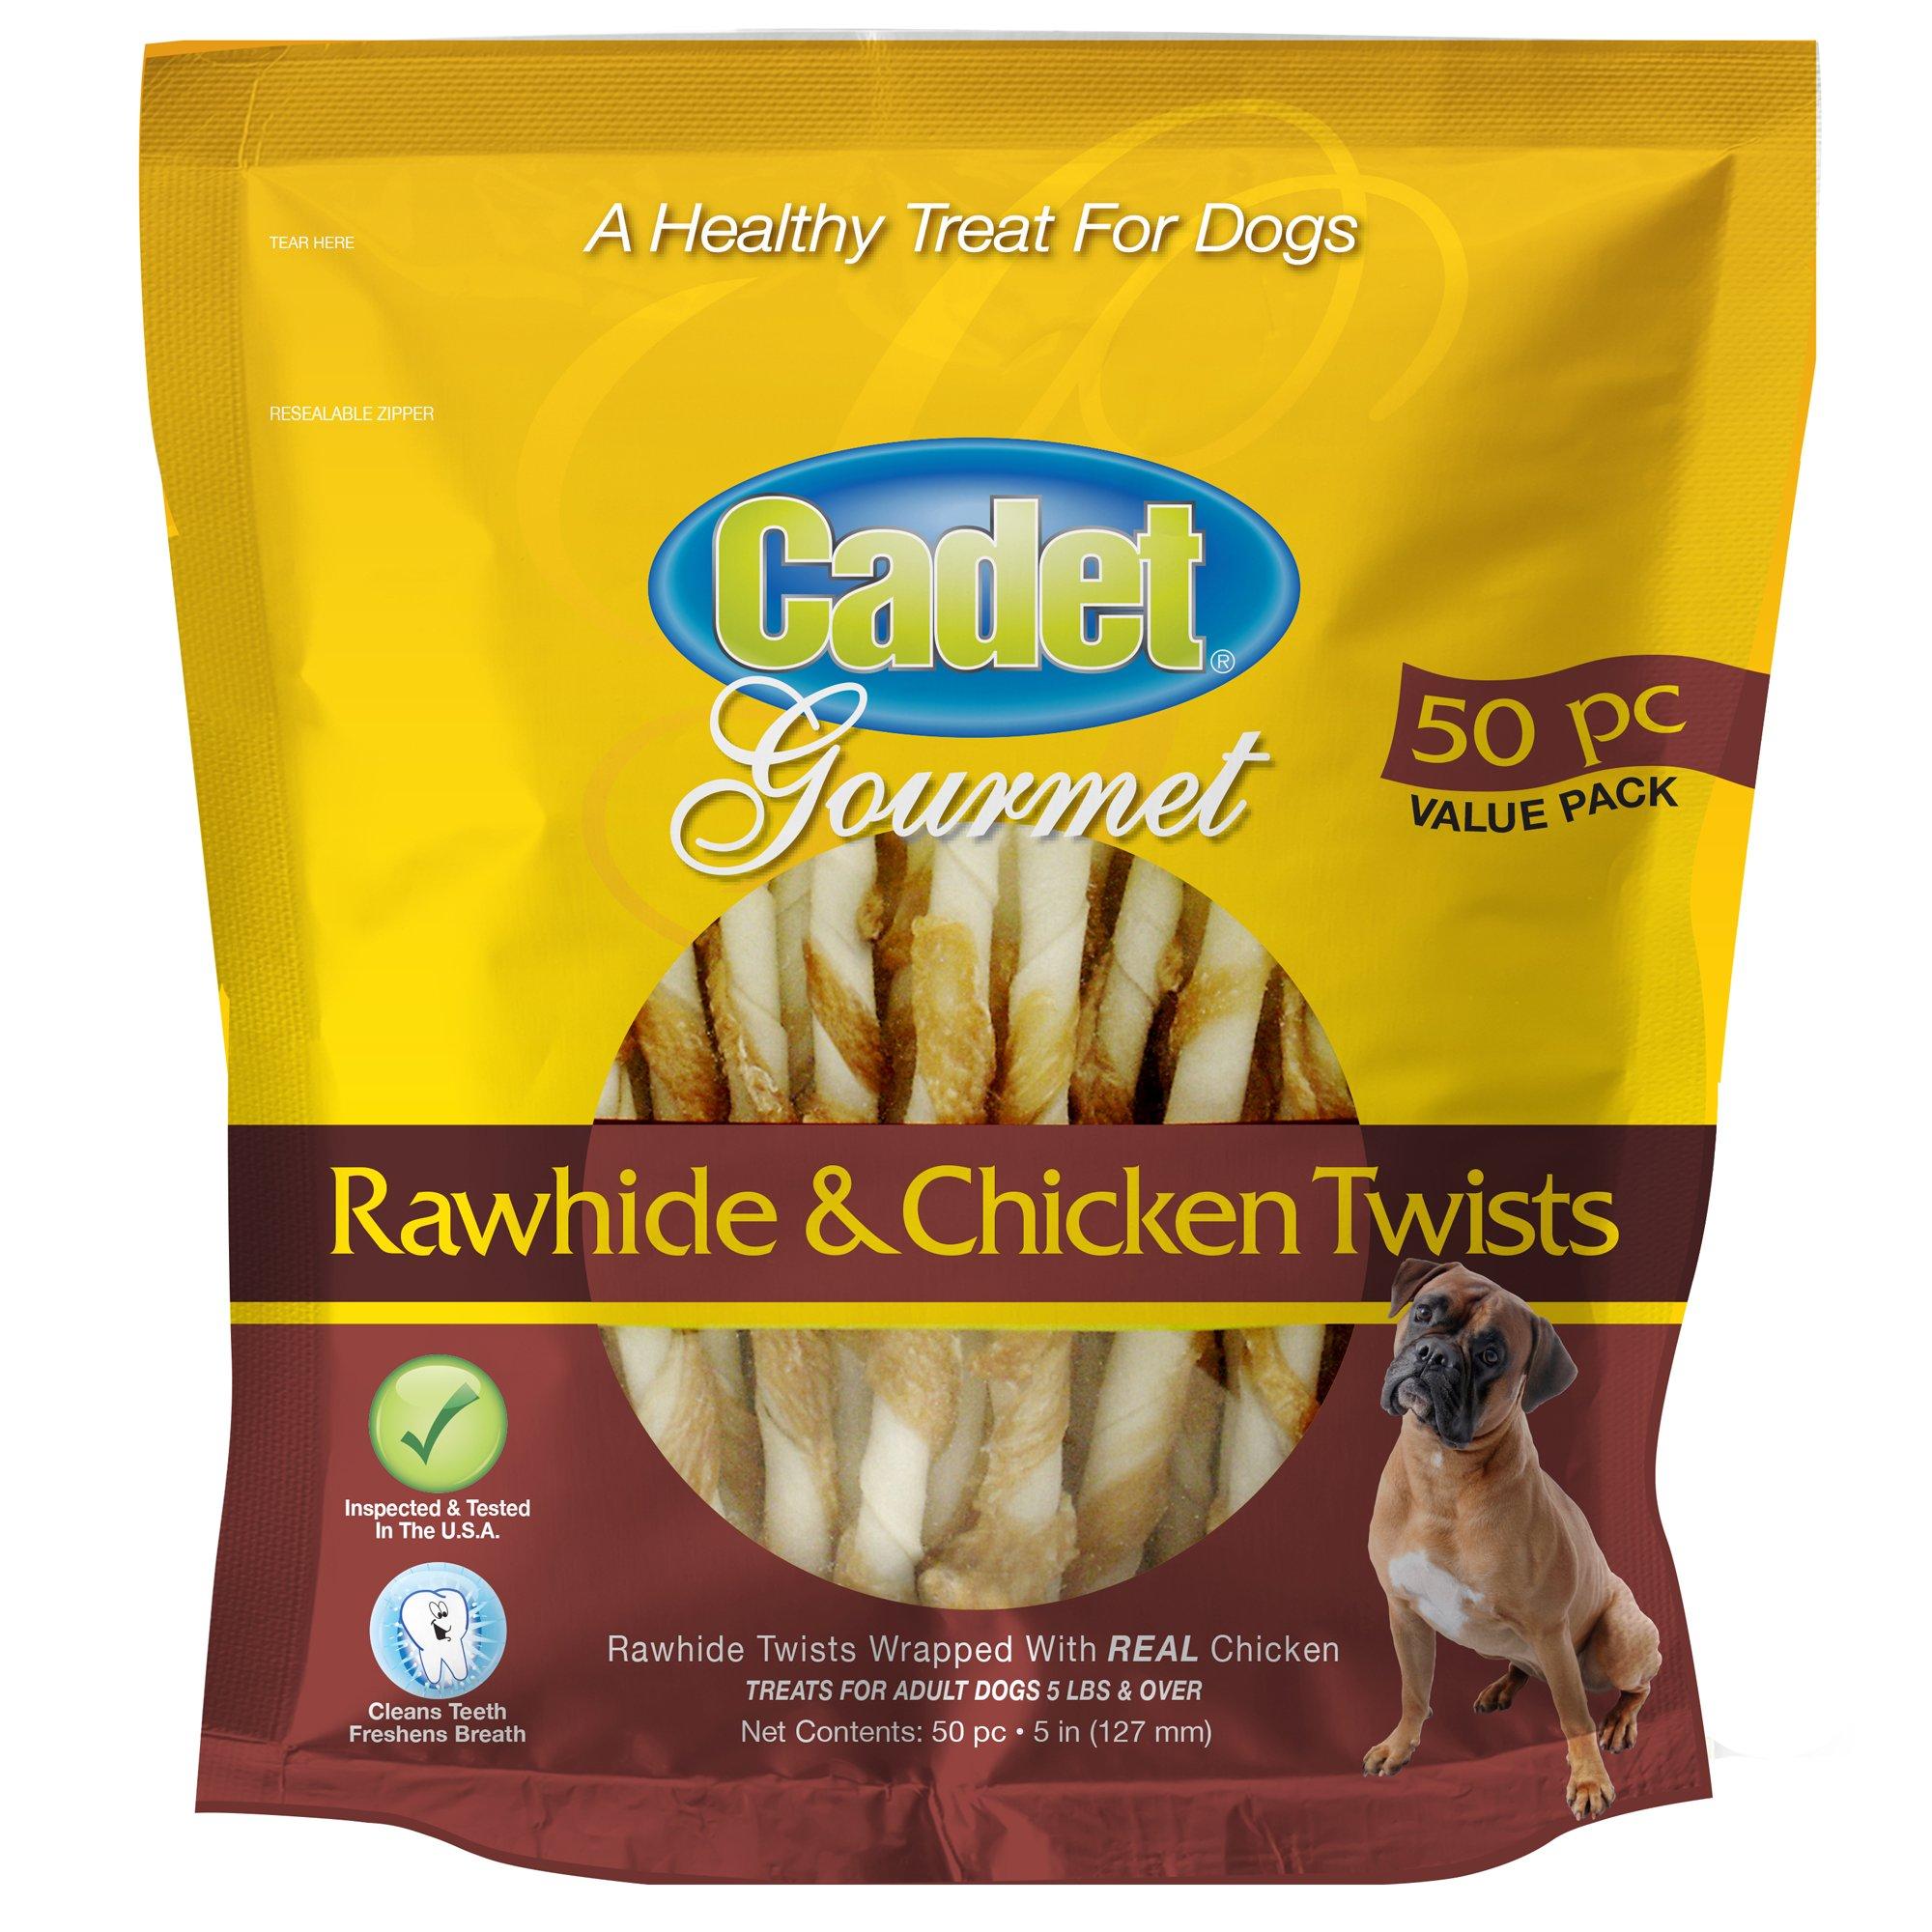 Cadet Chicken and Rawhide Dog Chew Treats, 50 Ct